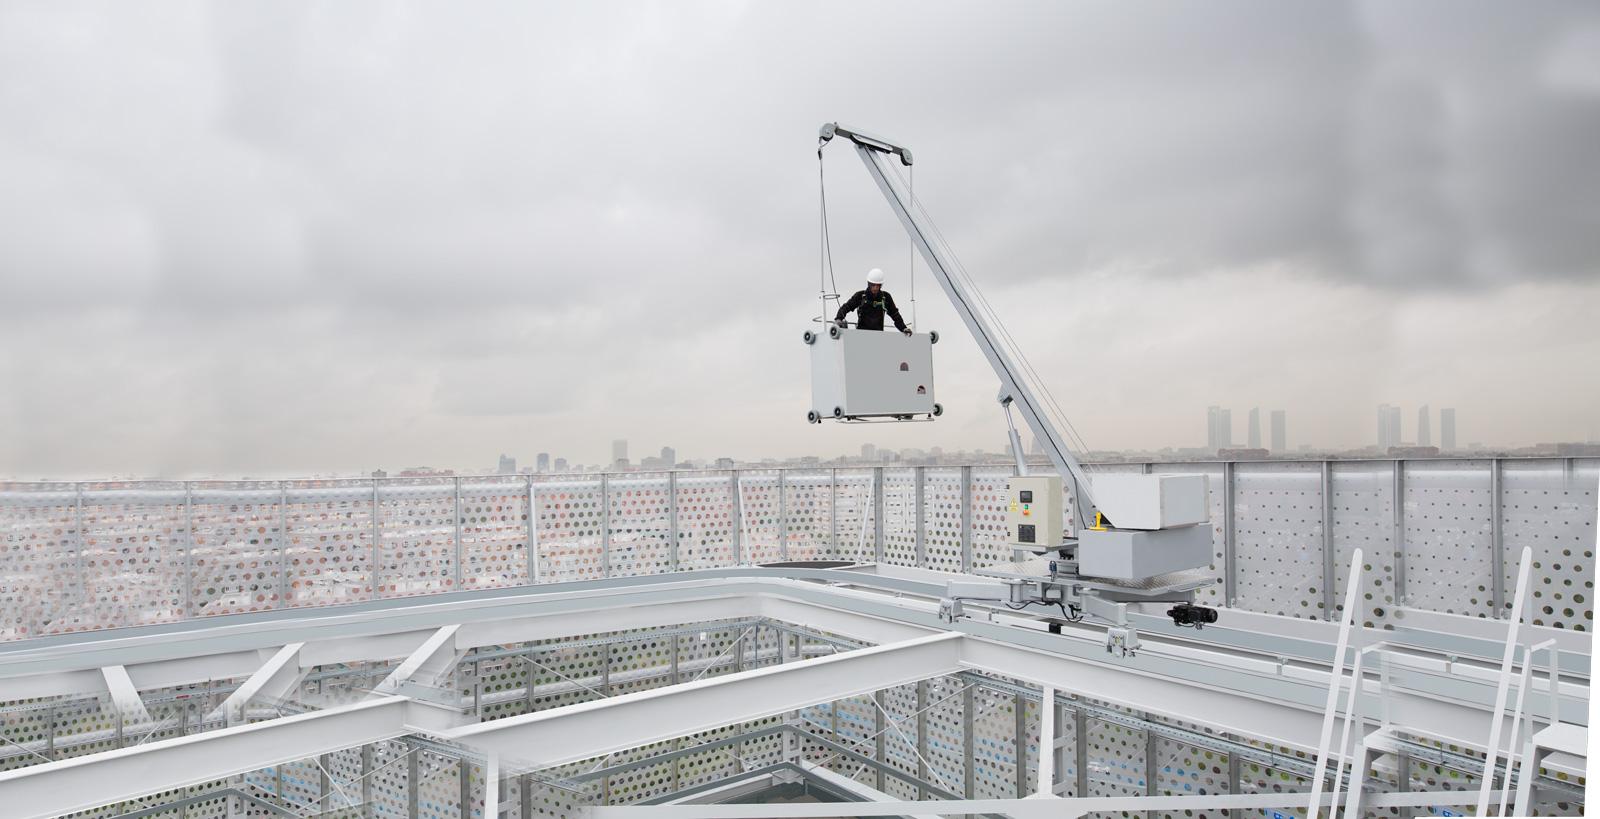 Jeřábové systémy pro údržbu budov